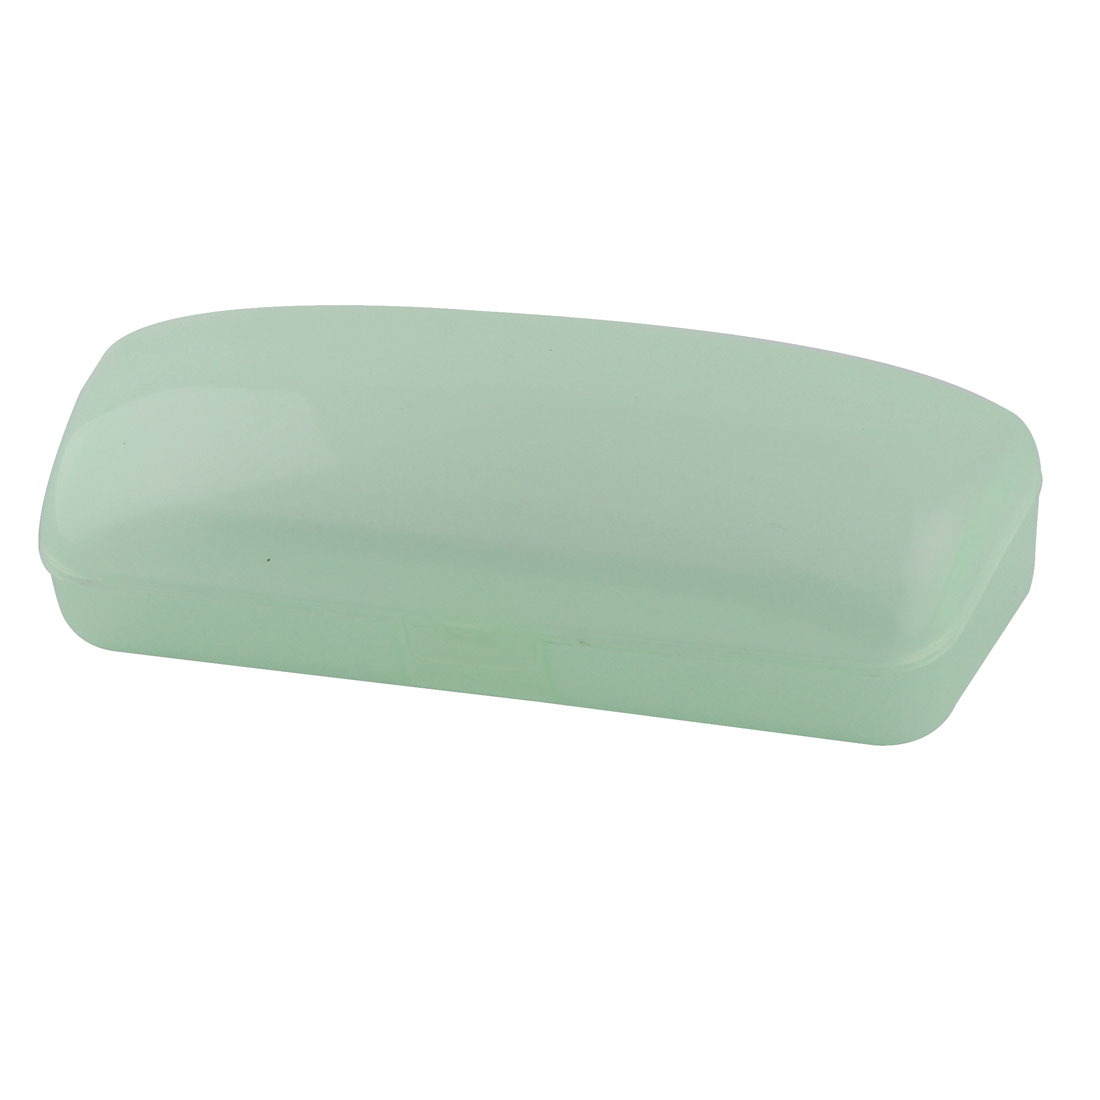 Plastic Spectacles Eyeglasses Eyewear Glasses Storage Case Box Holder Green